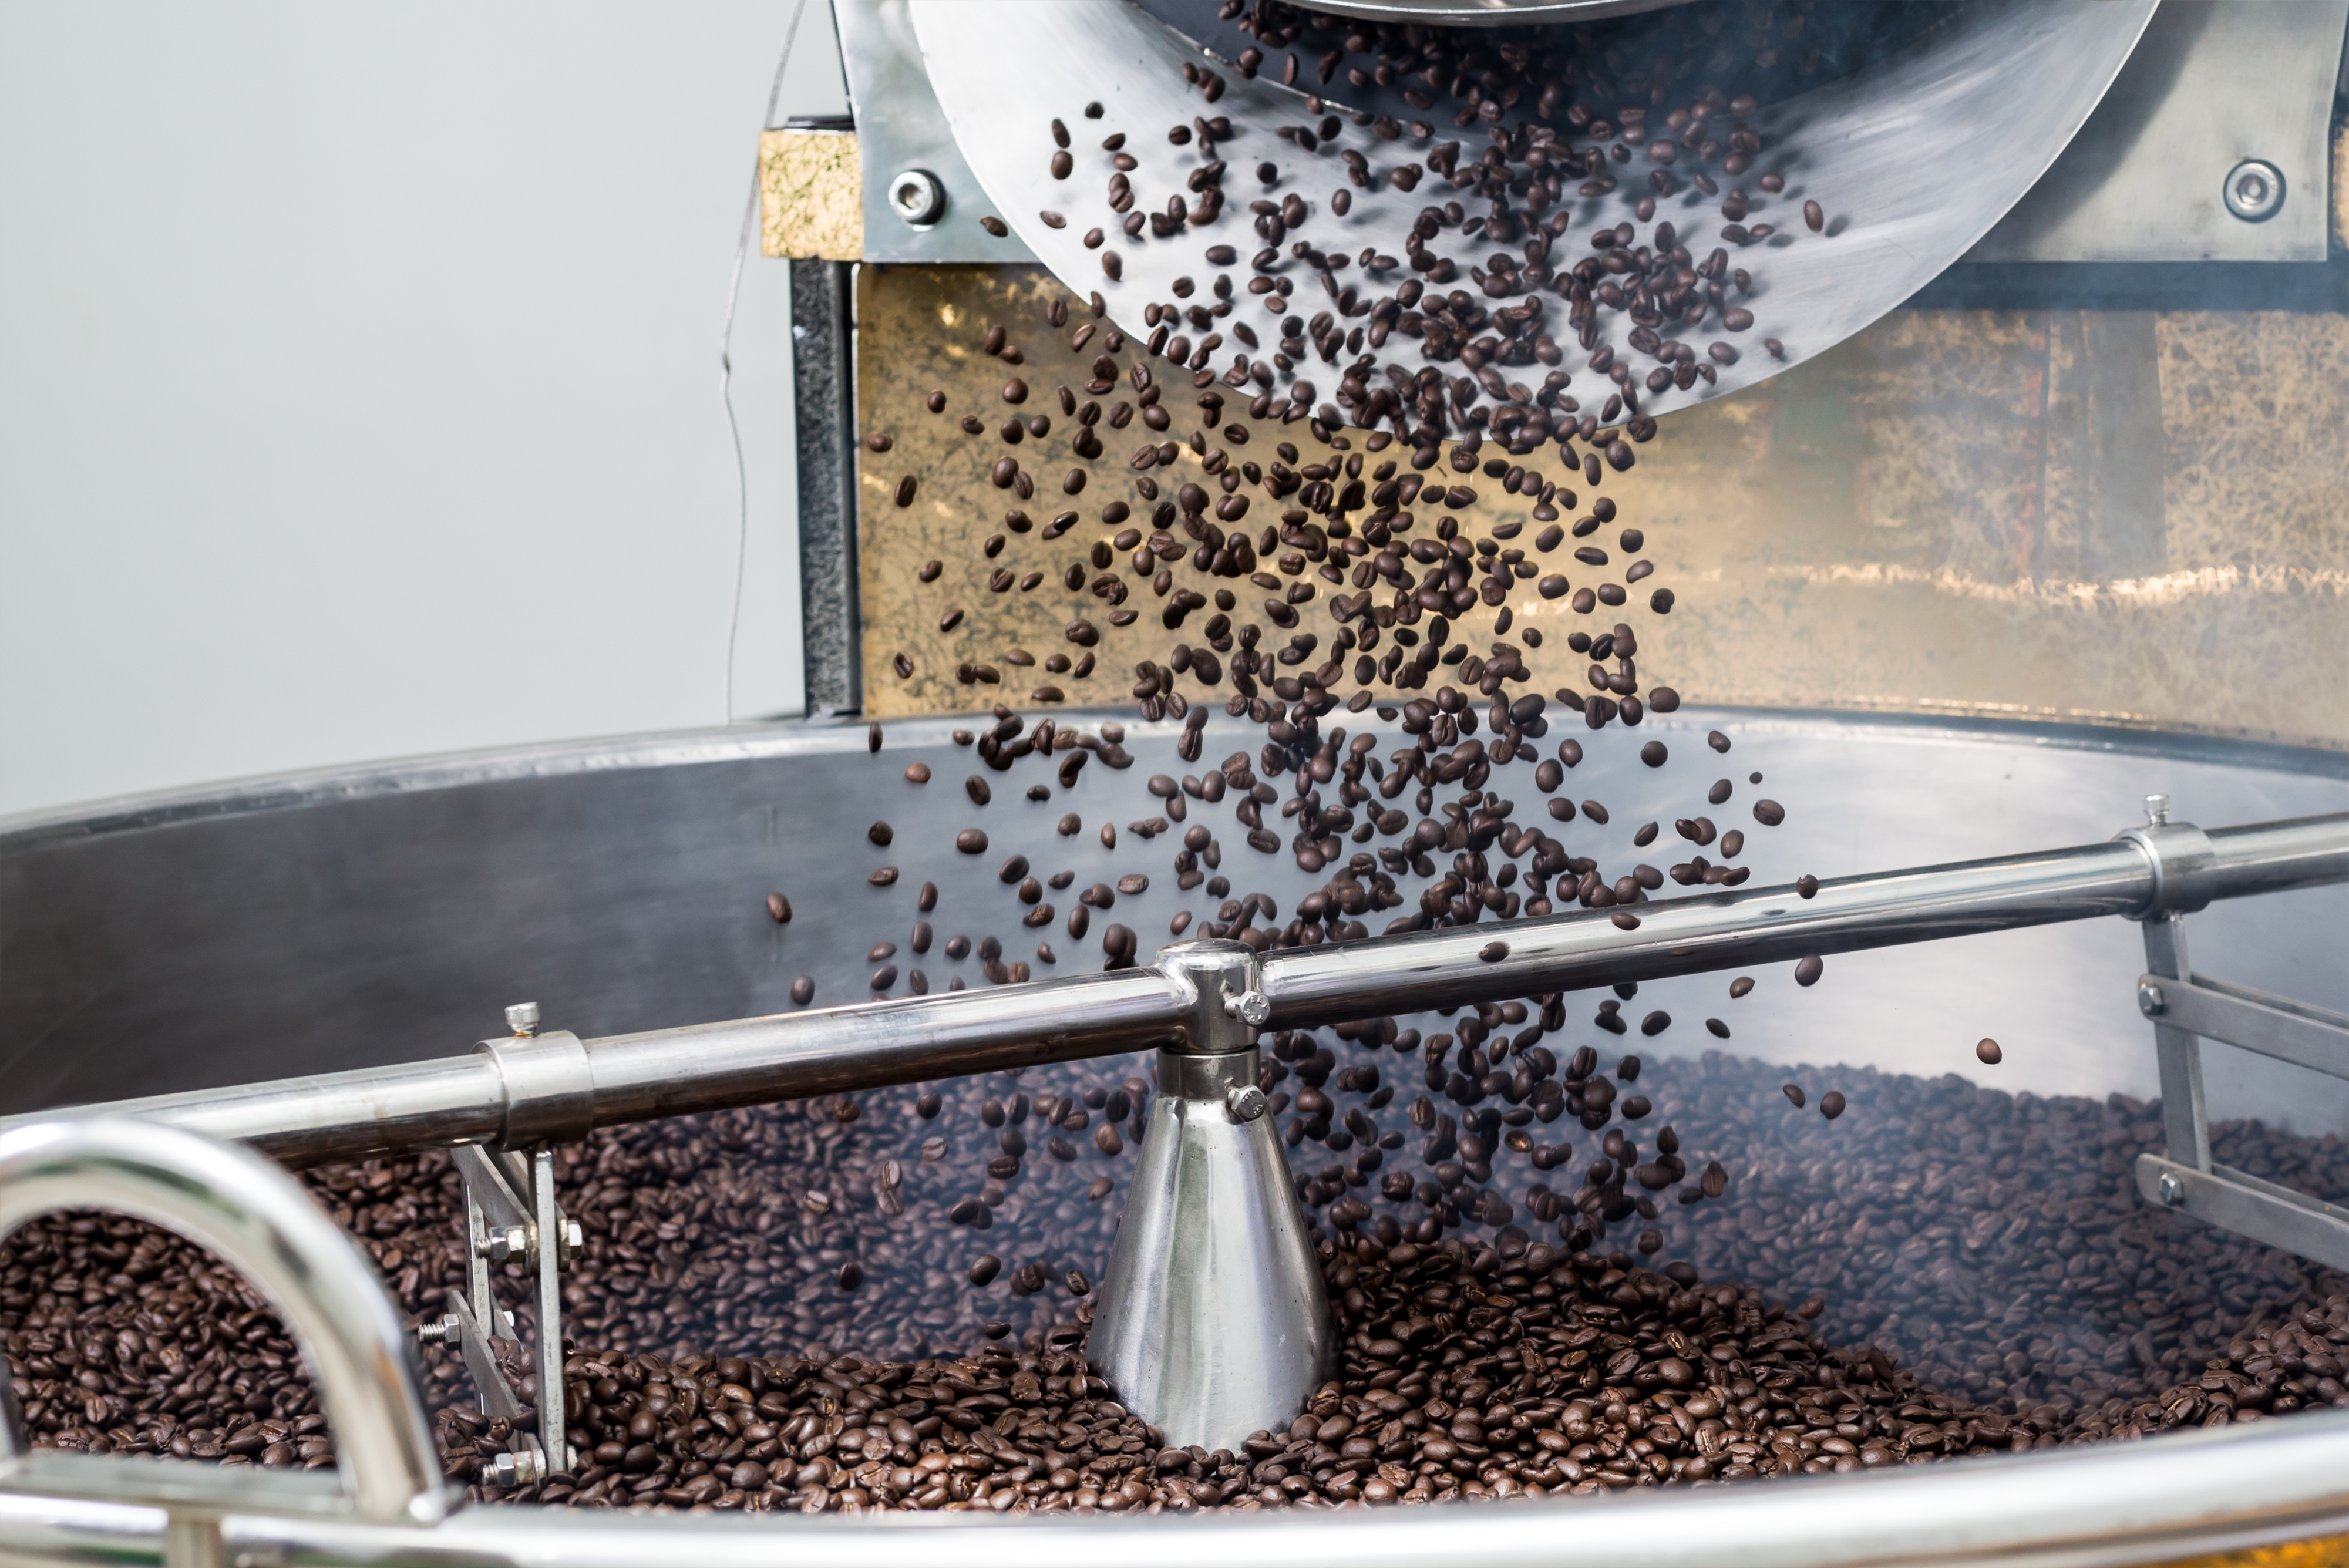 Coffee beans falling off roasting machine